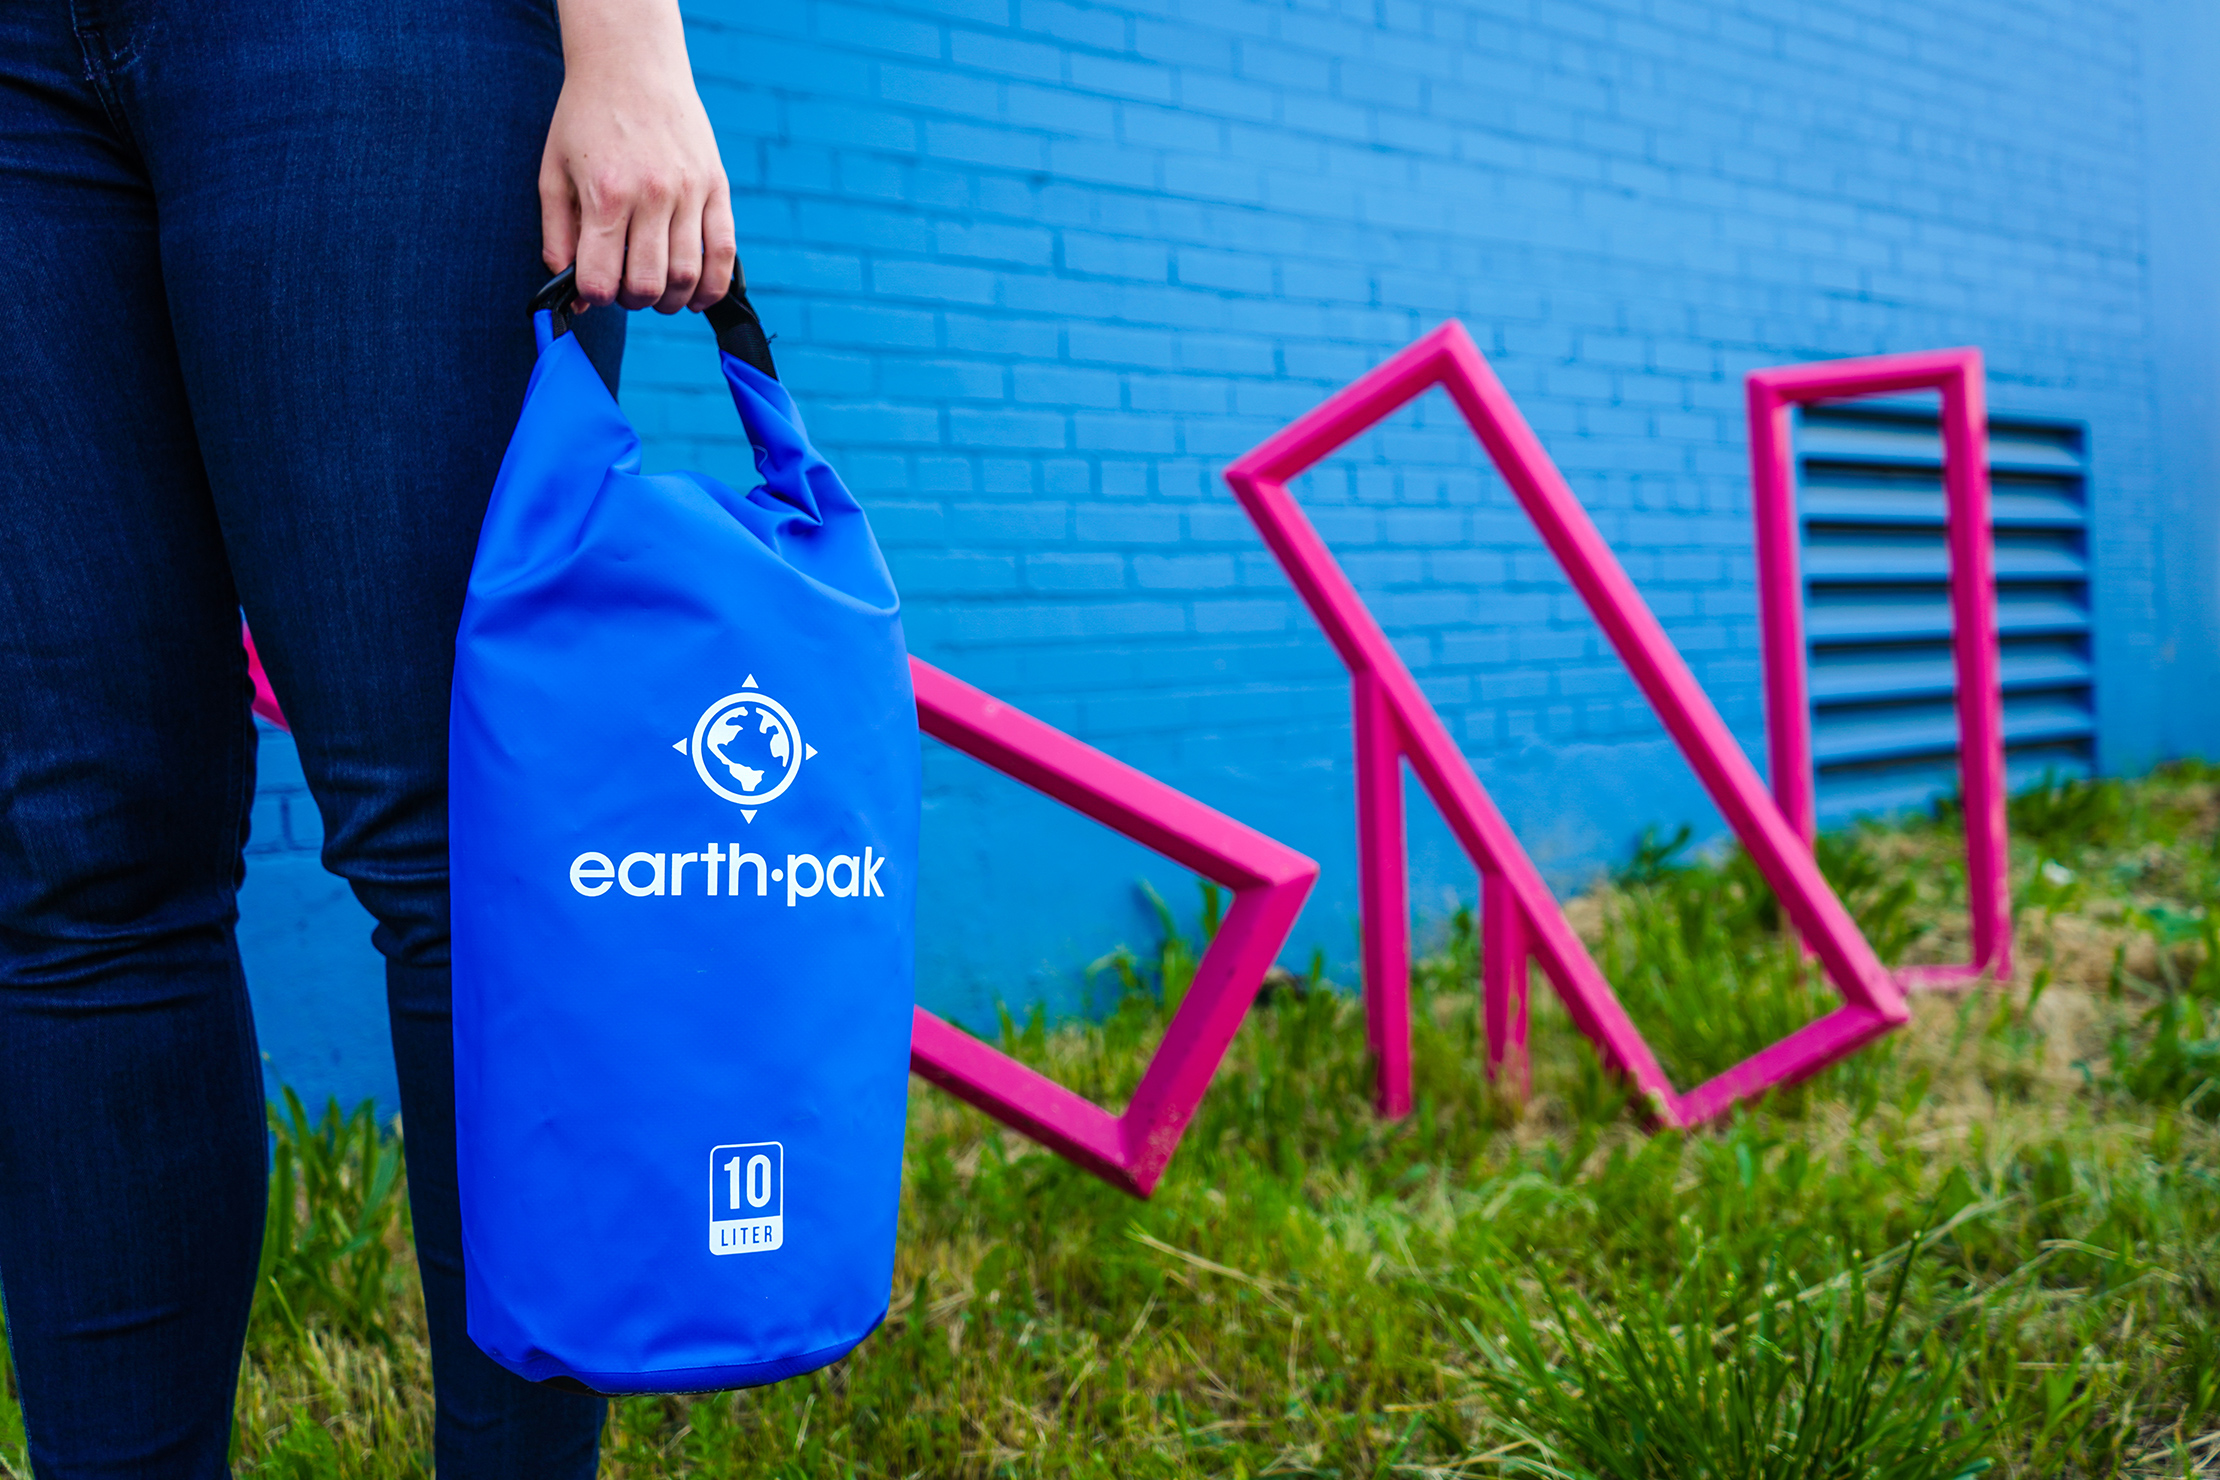 Earth Pak Original Waterproof Dry Bag Carry By Hand